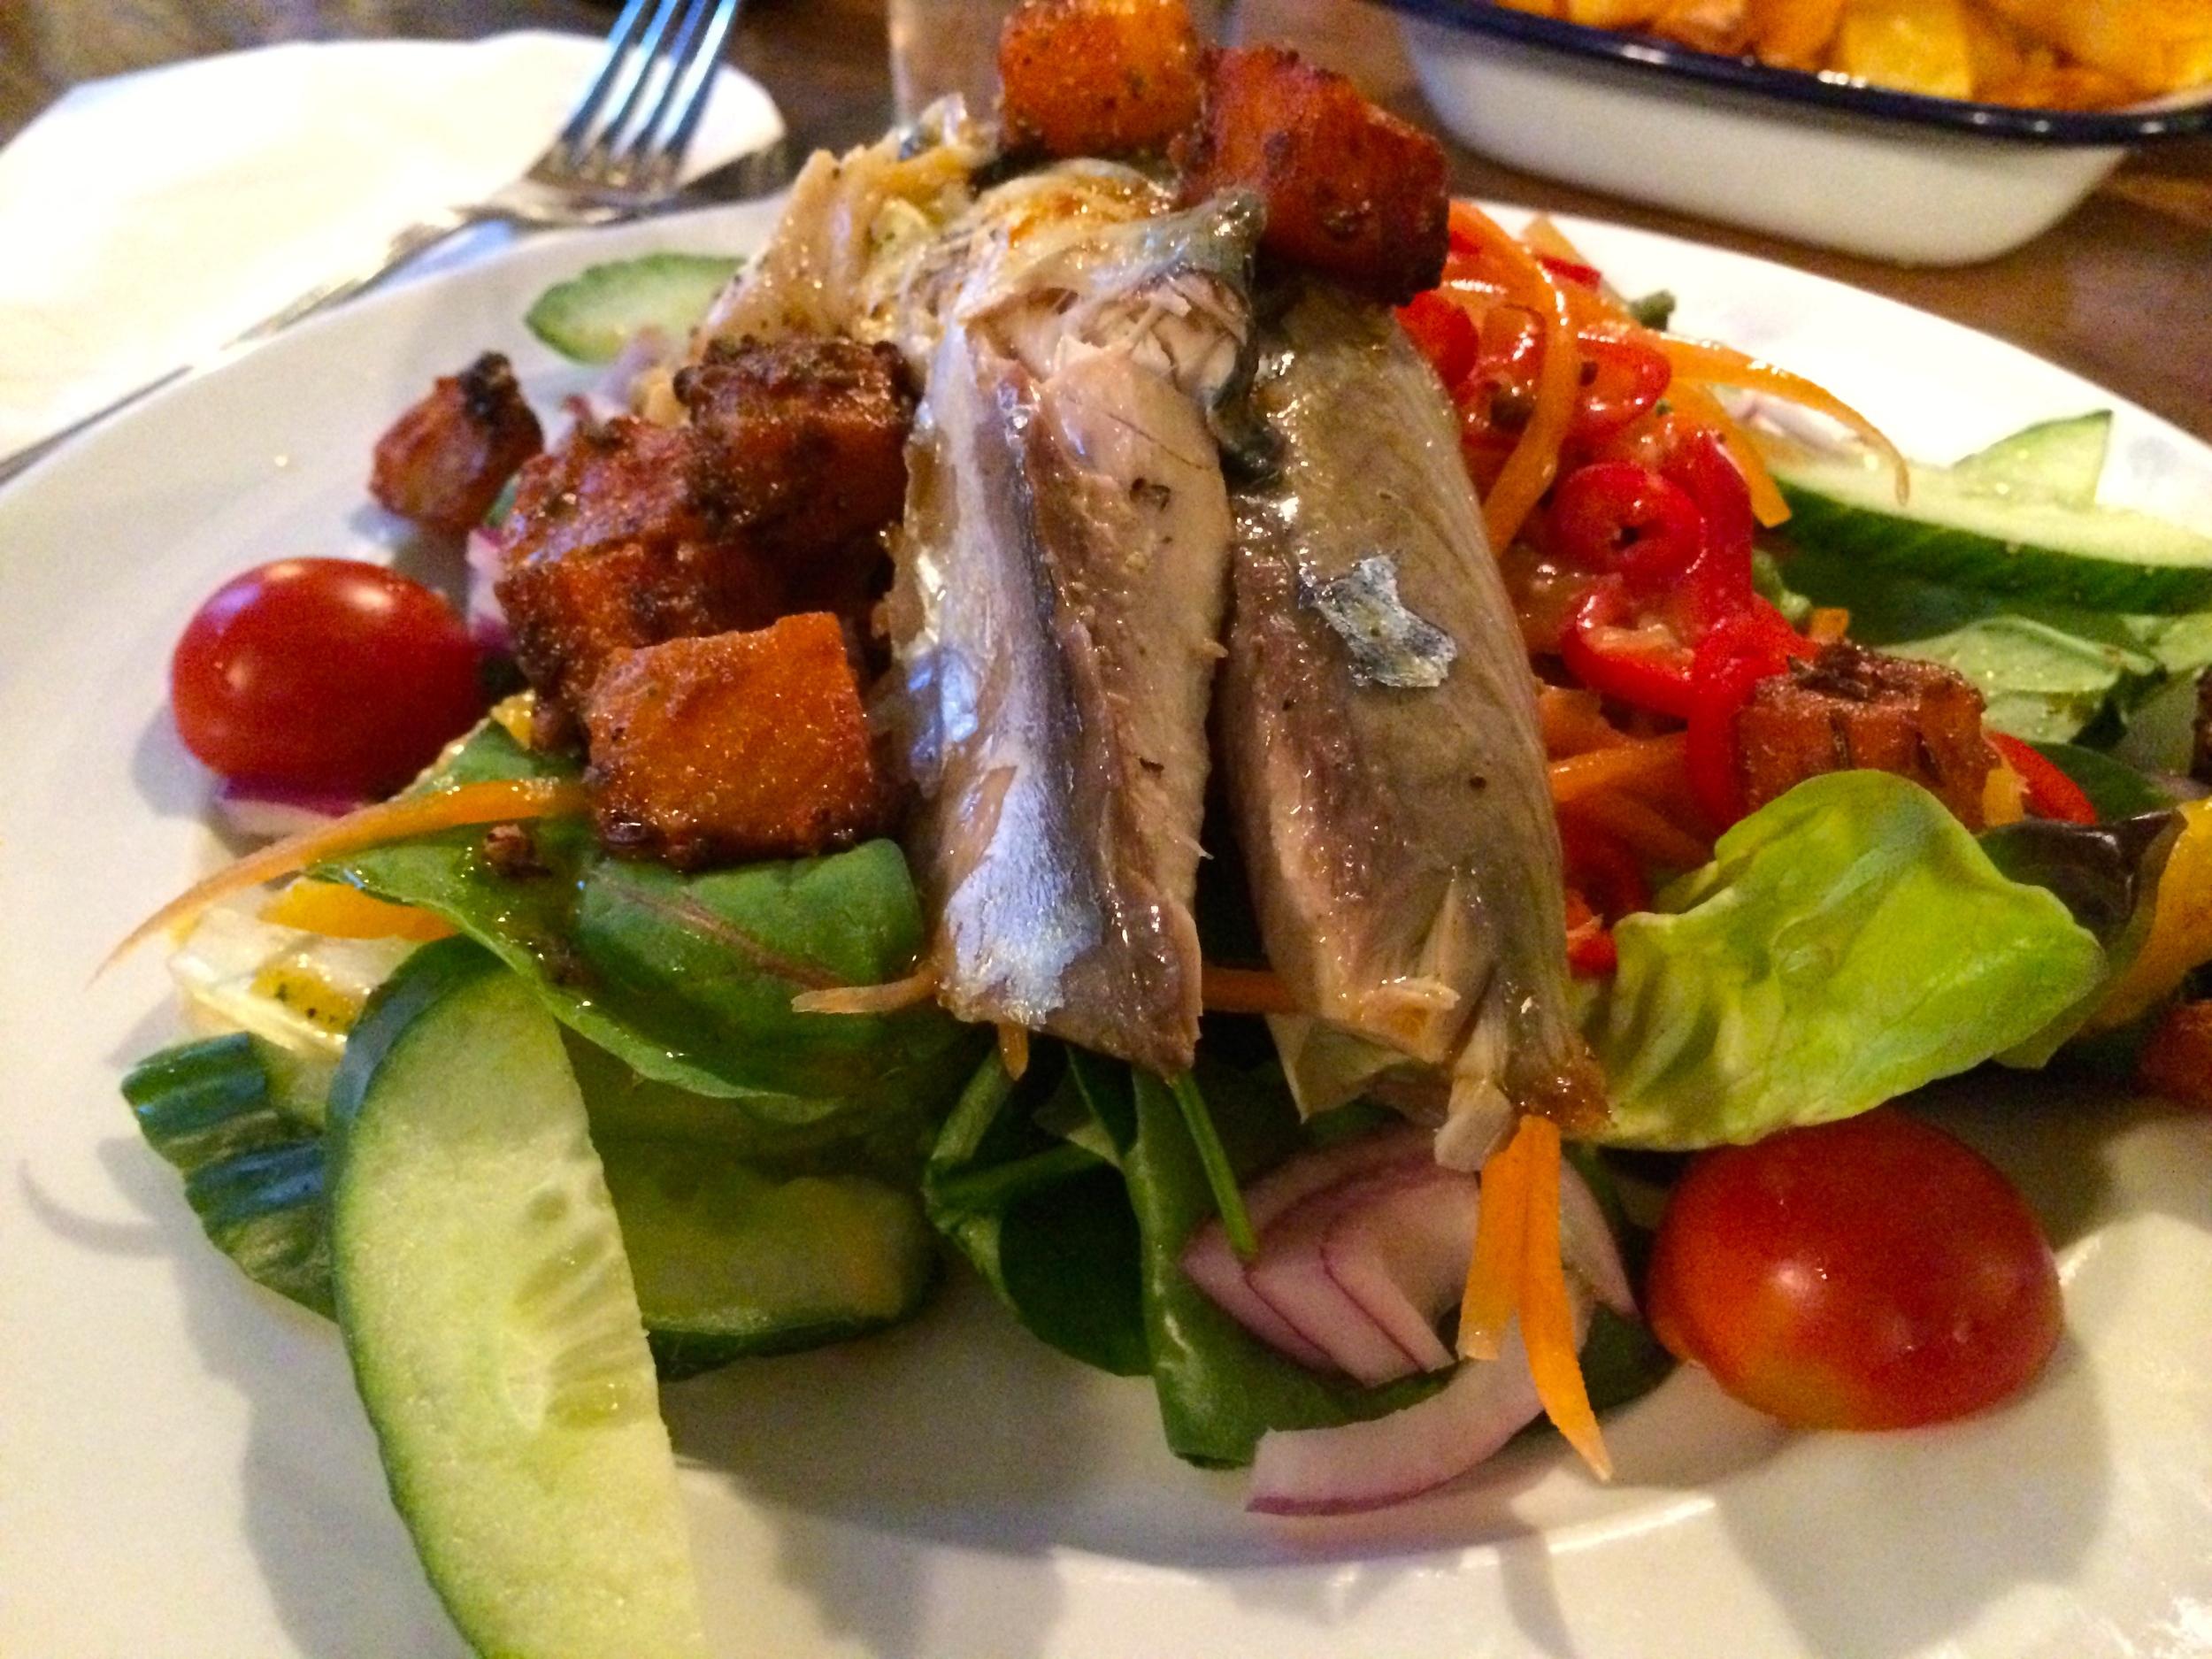 Warm Mackerel, Watercress, Squash, Orange and and Chilli Salad